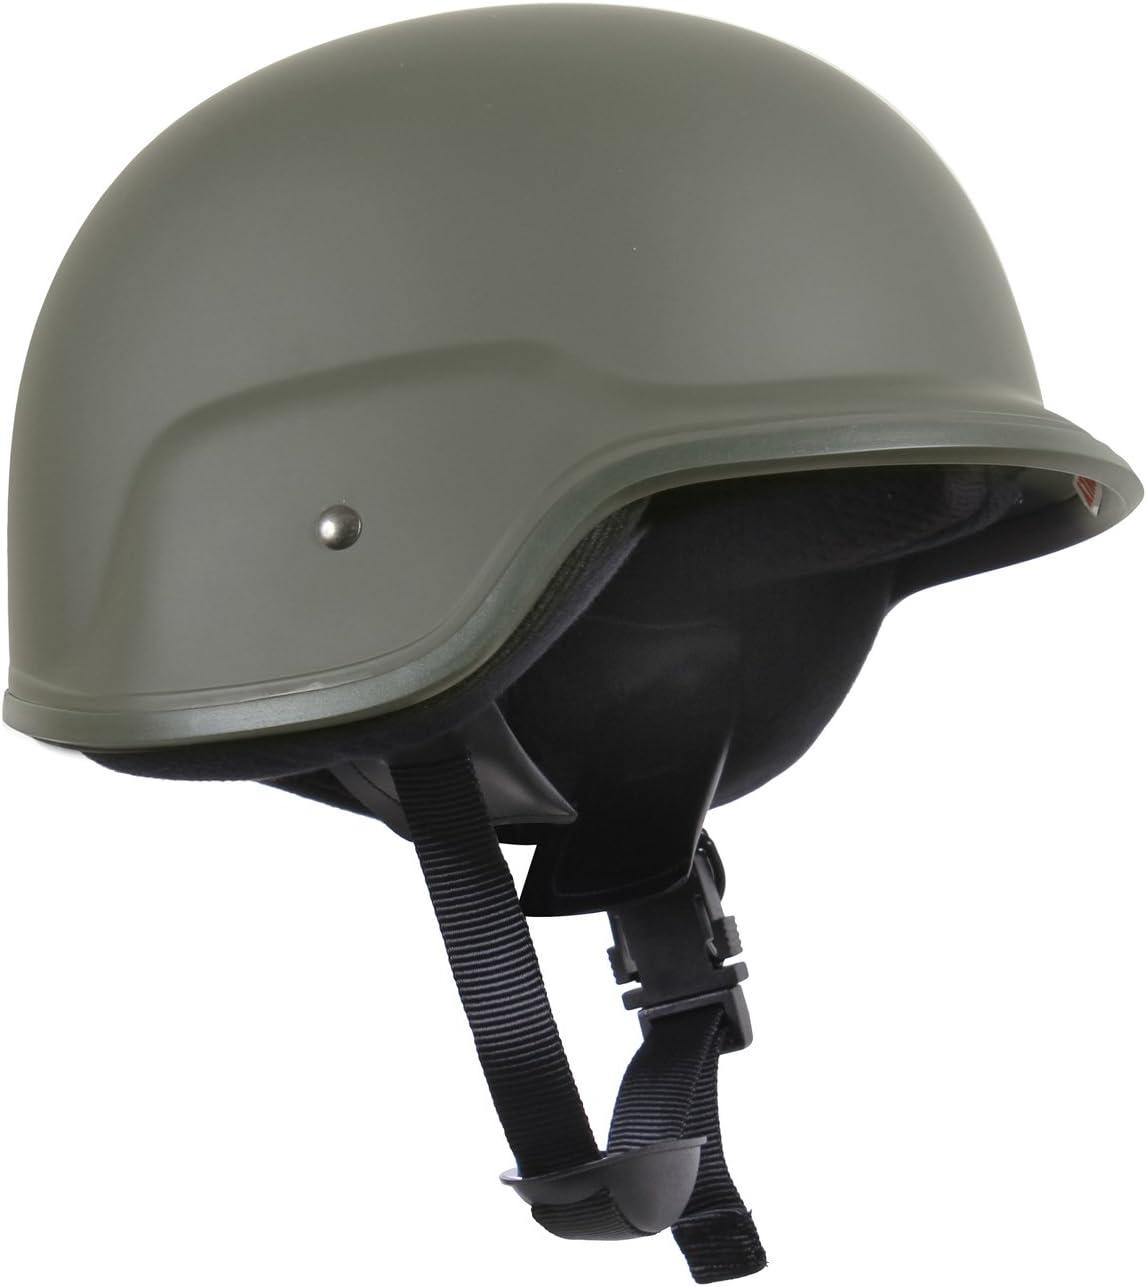 Rothco G.I Style Abs Plastic Helmet